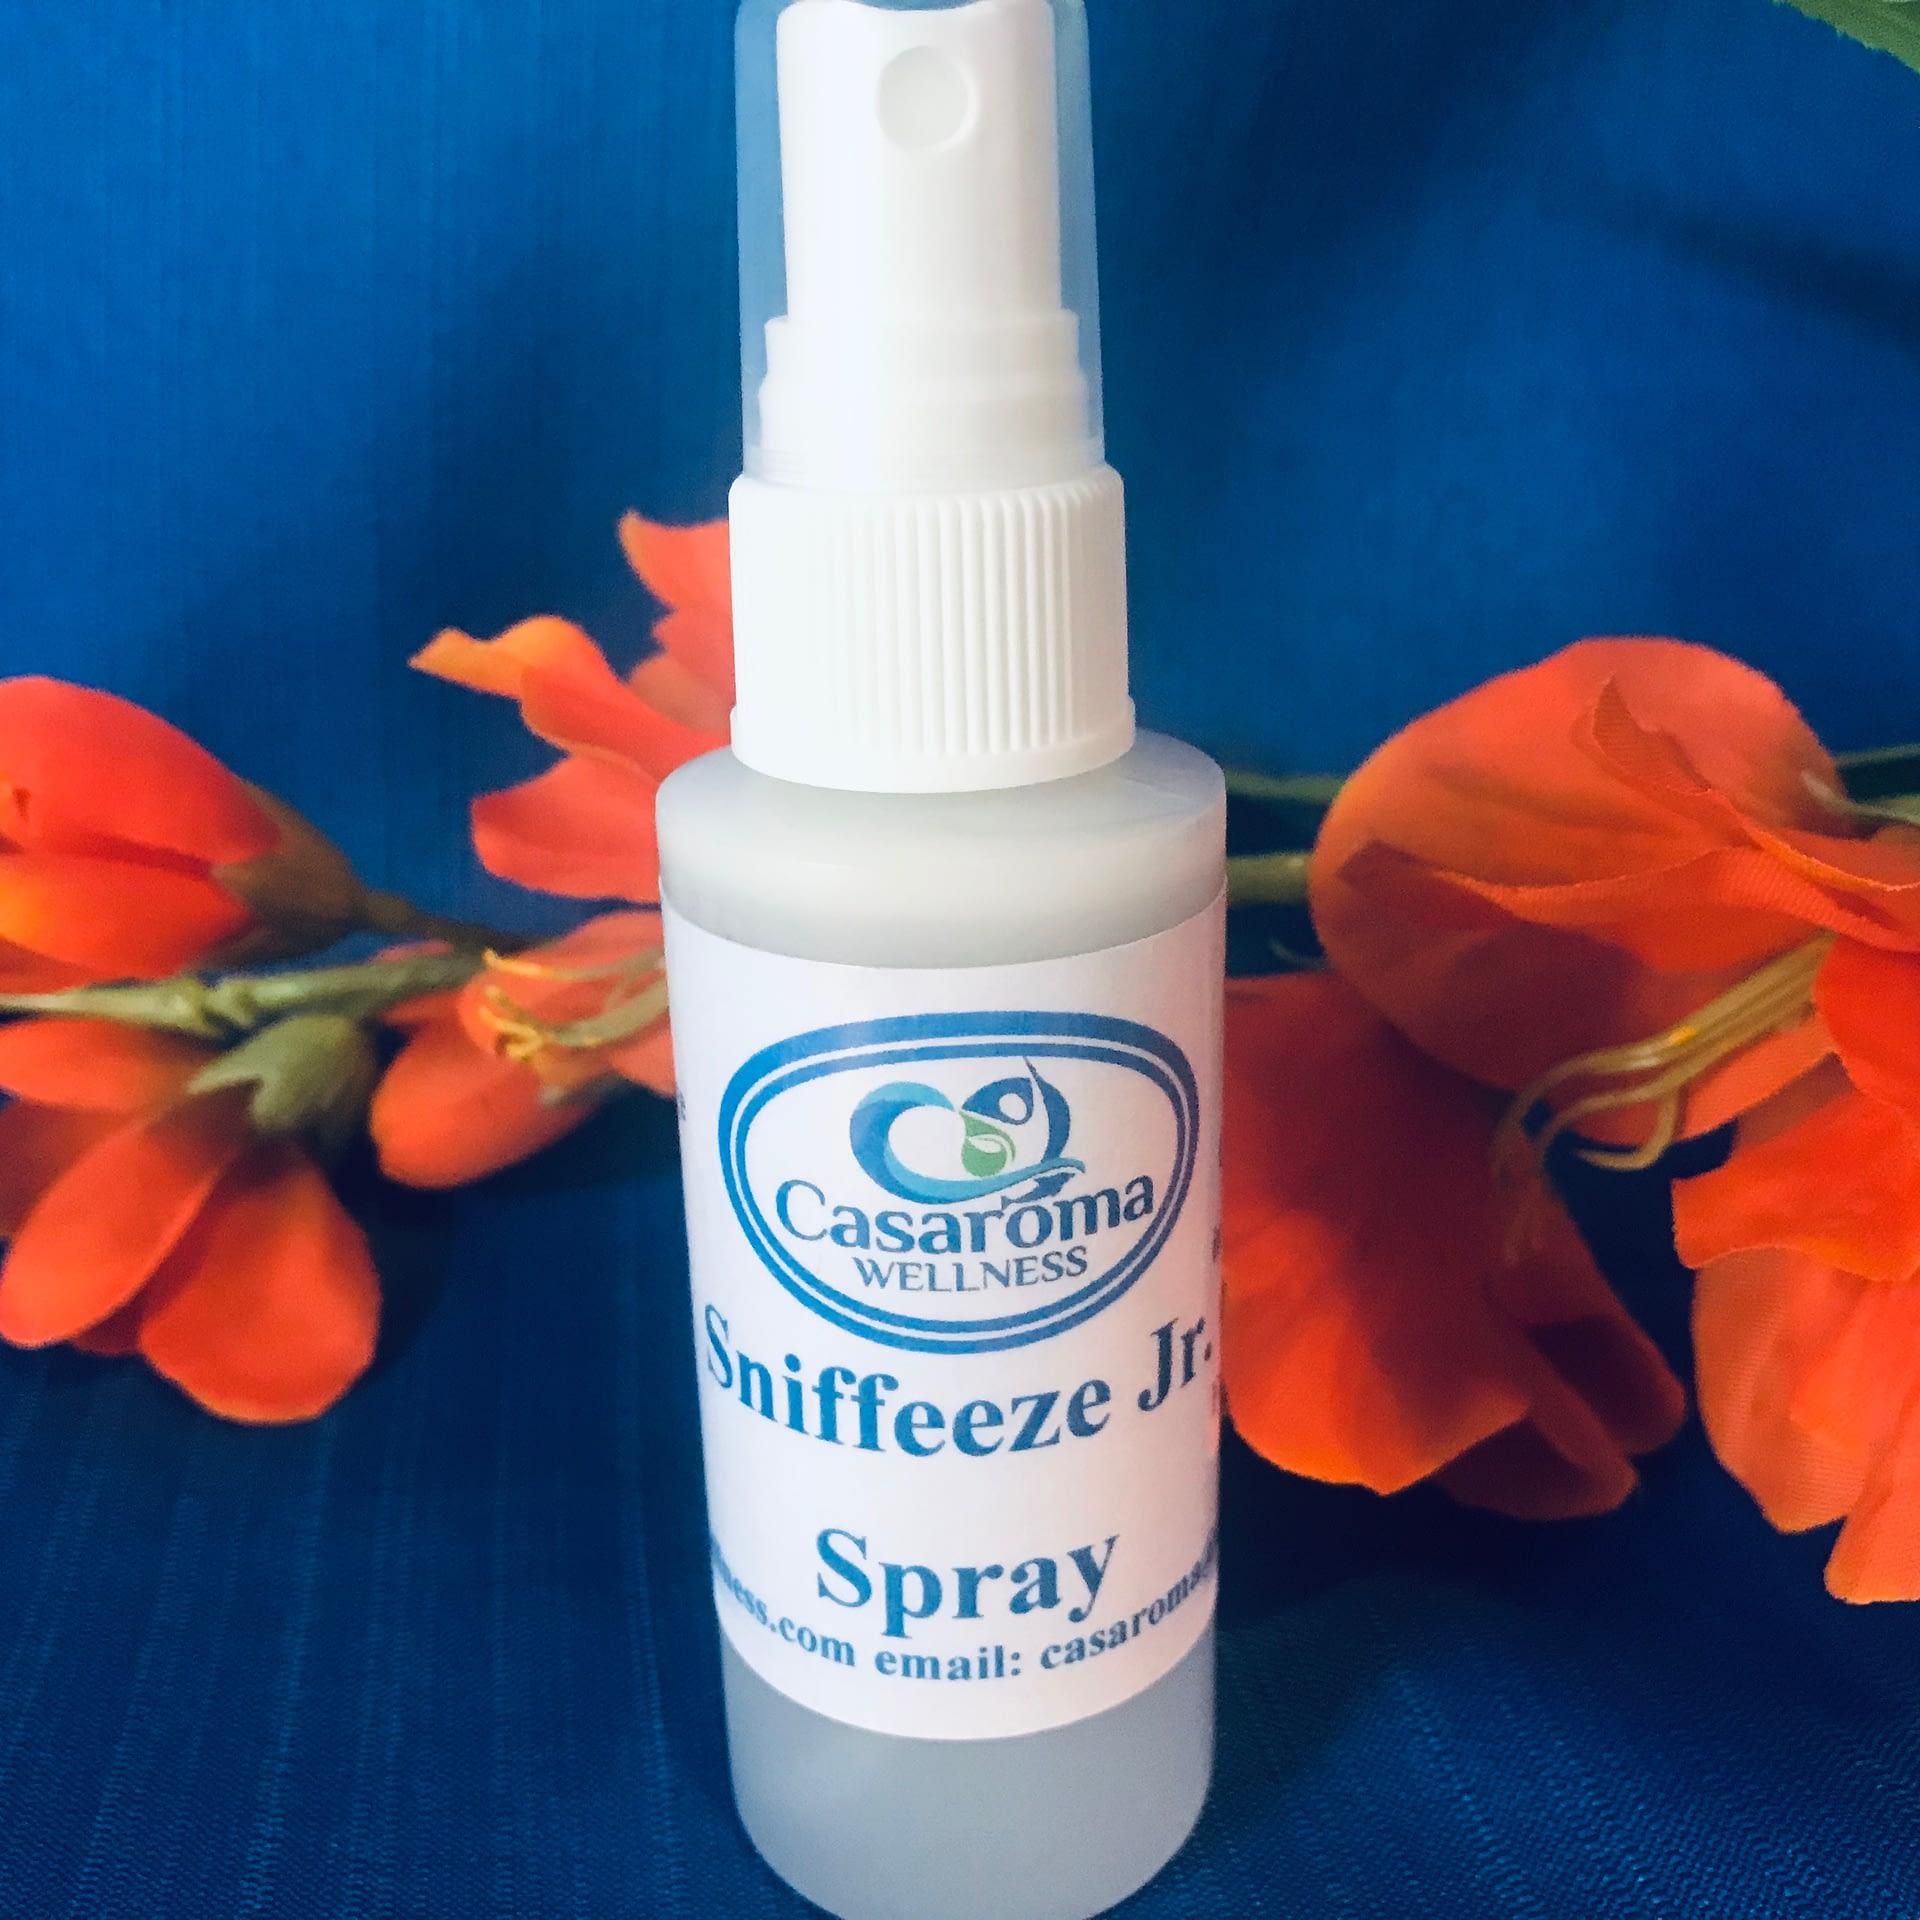 Sniffeeze Jr. Spray